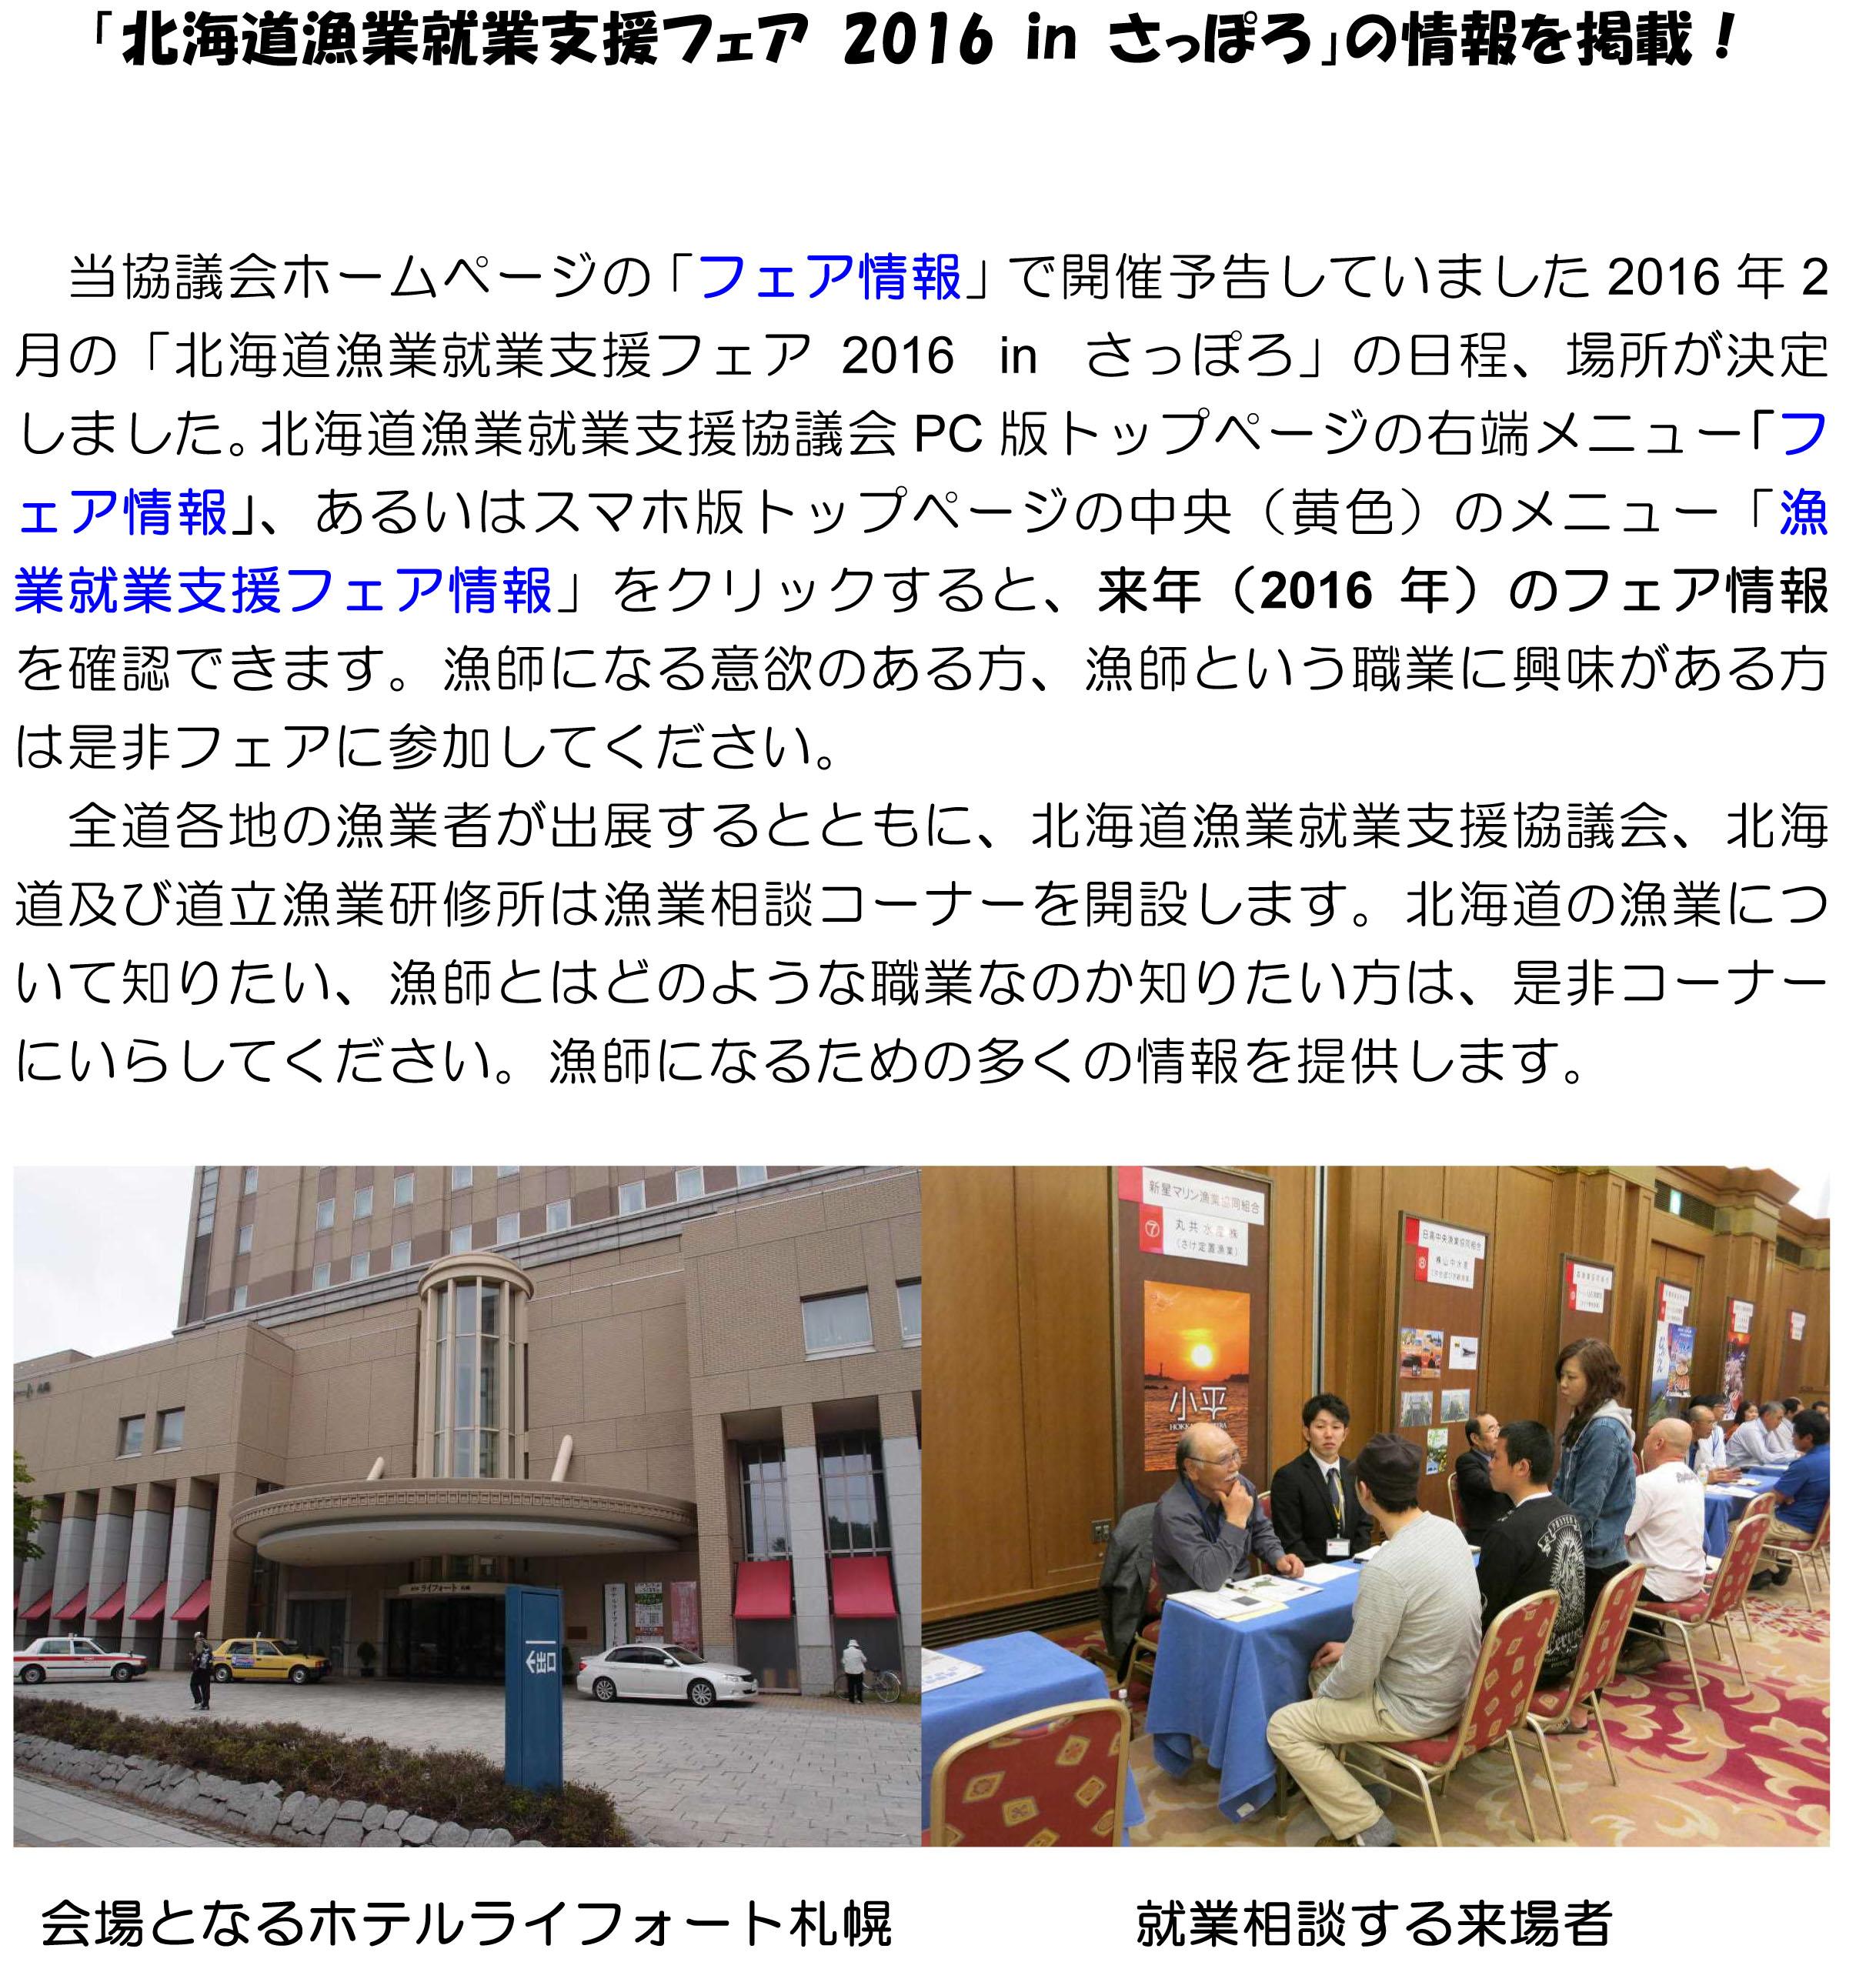 HP原稿(H27札幌フェア開催決定の知らせ)のコピー